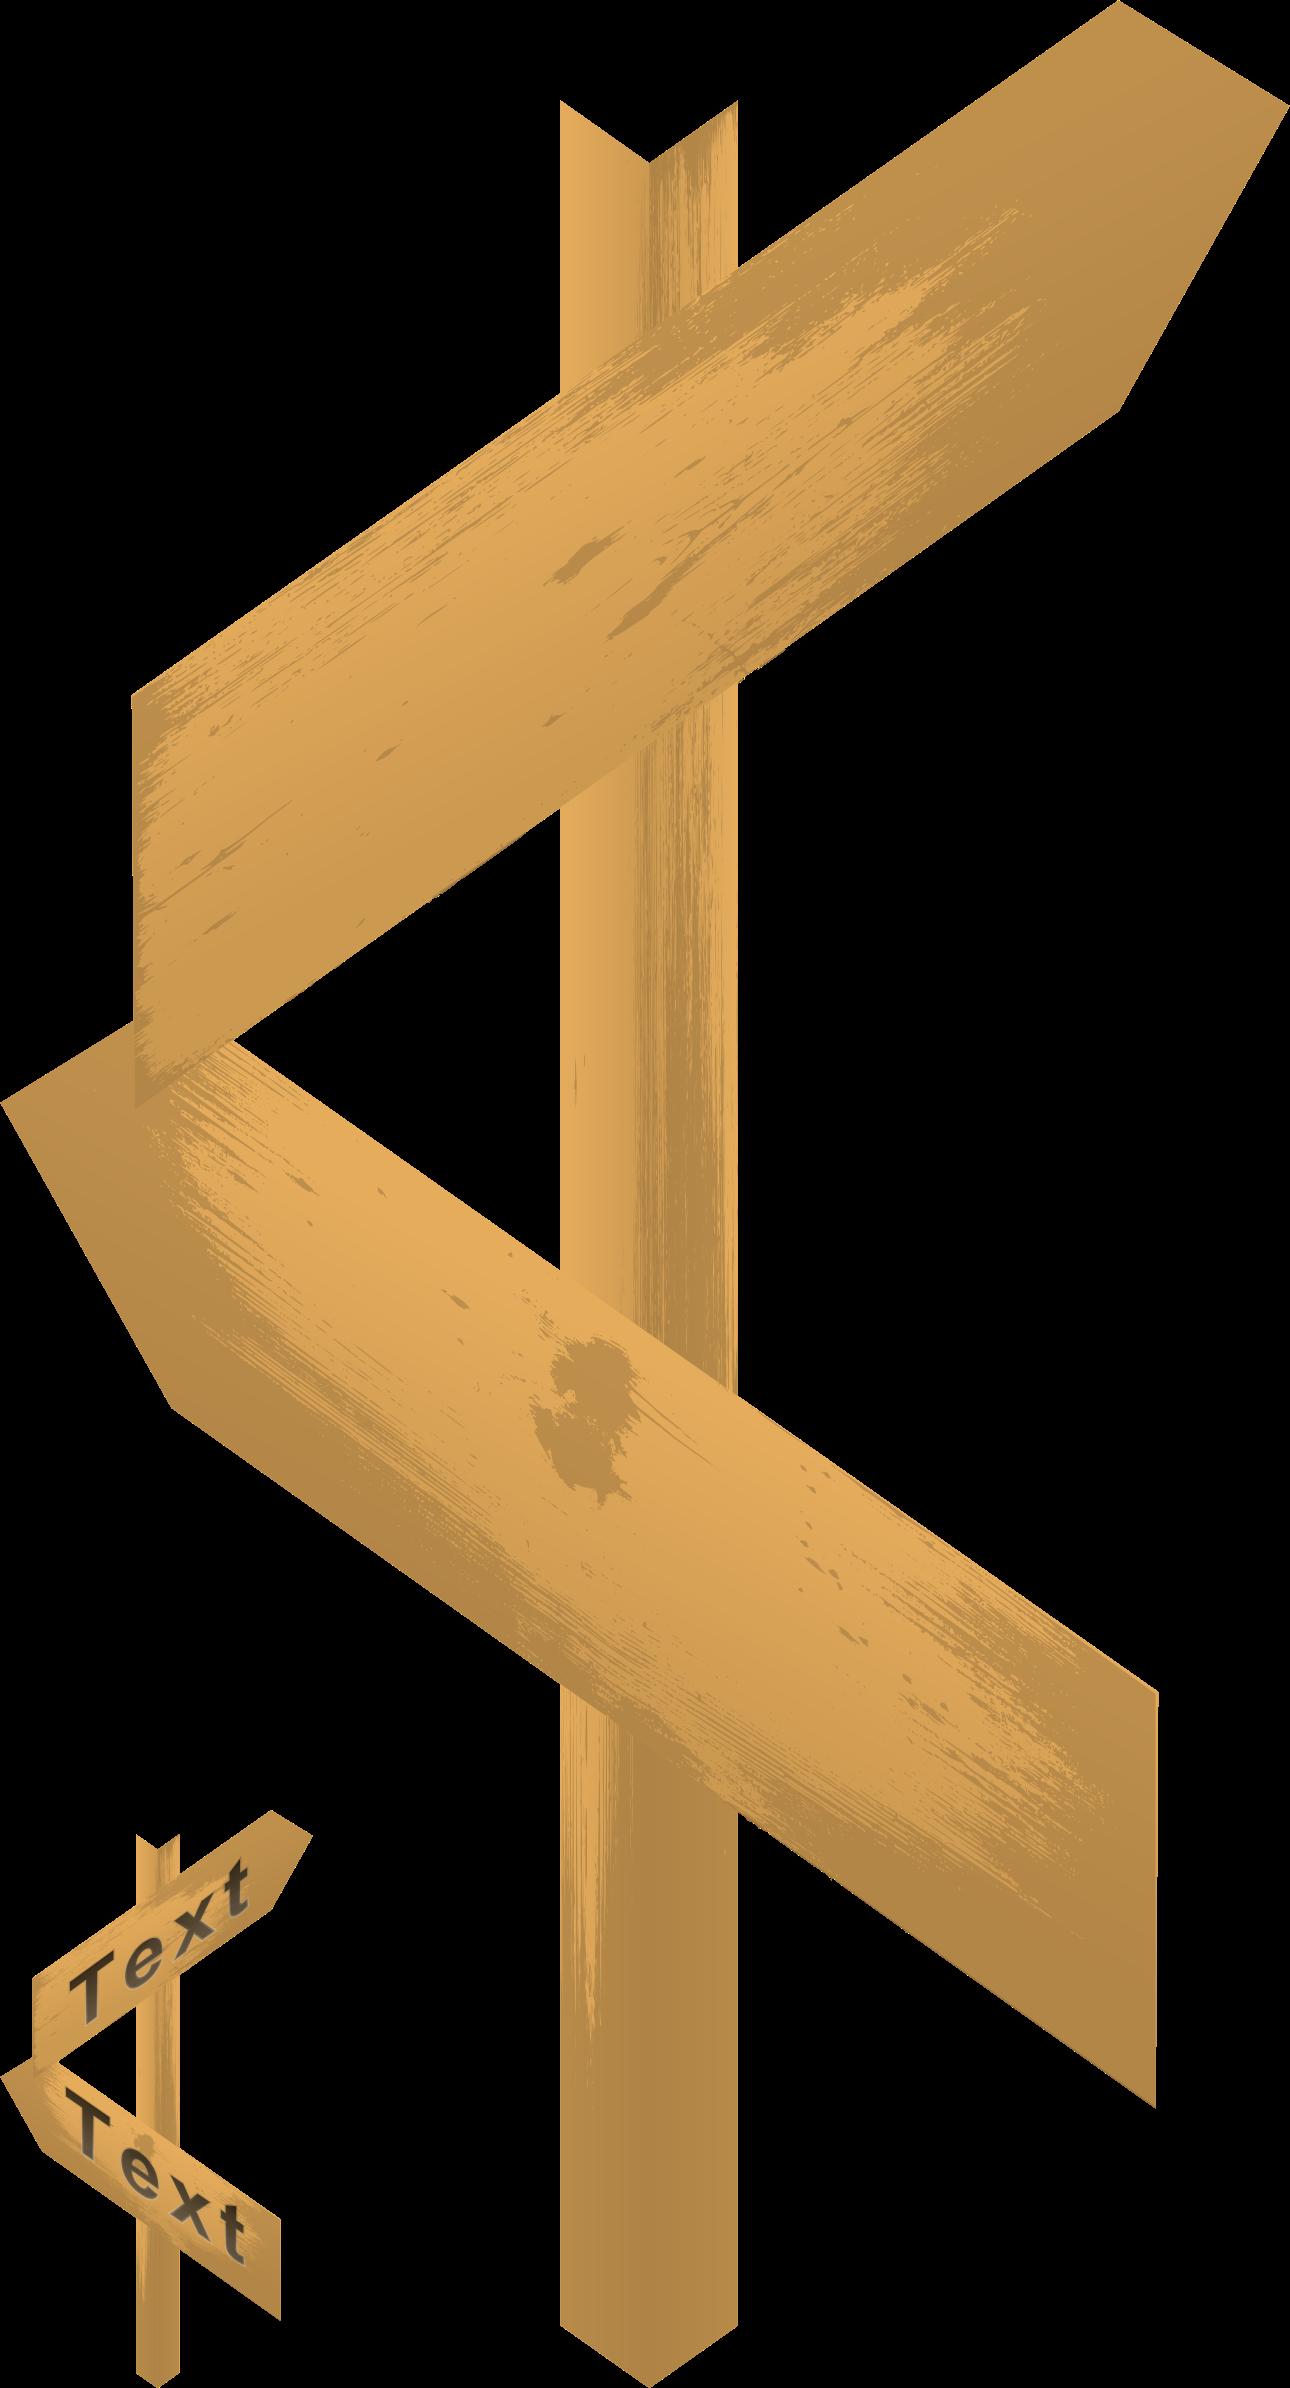 Arrow clipart wood. Blank sign big image